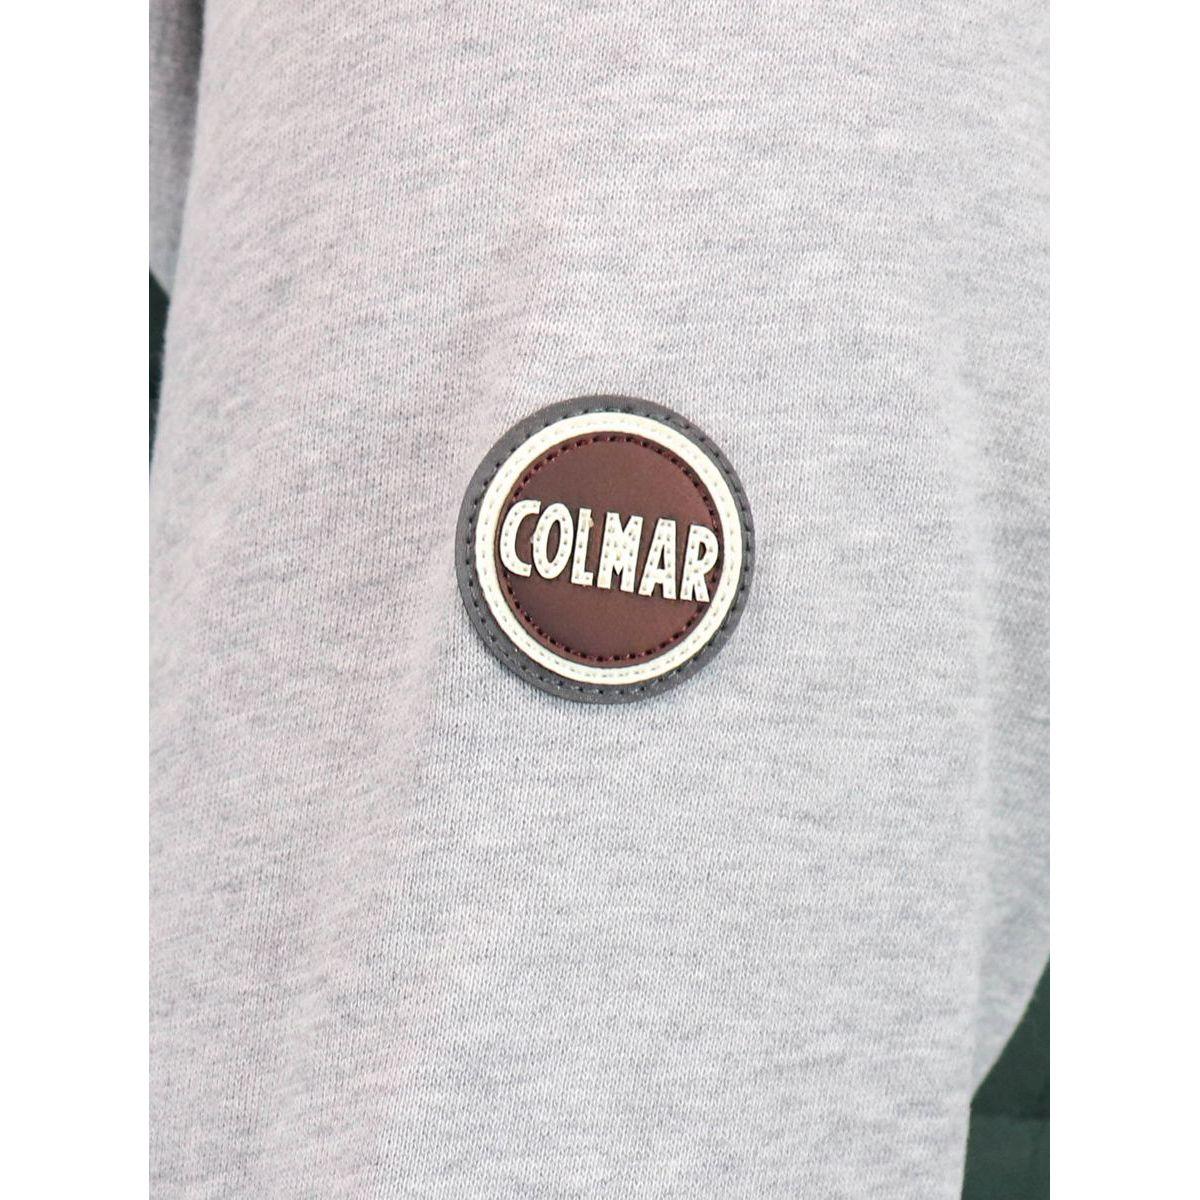 Sweatshirt in light wadding with ultrasound stitching Green Colmar